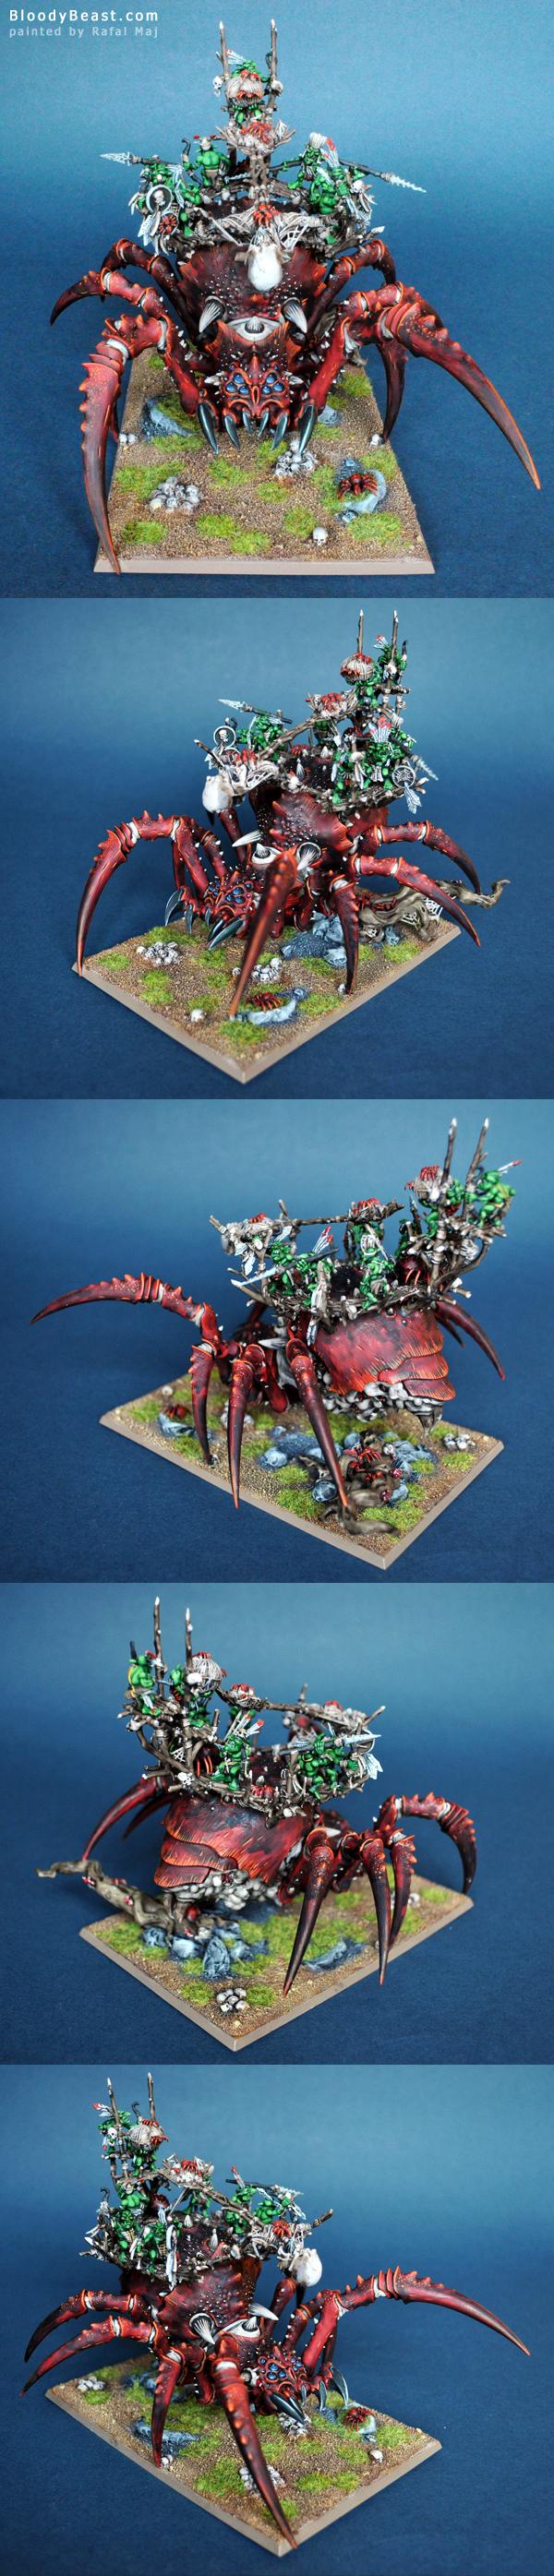 Arachnarok Spider with Catapult painted by Rafal Maj (BloodyBeast.com)